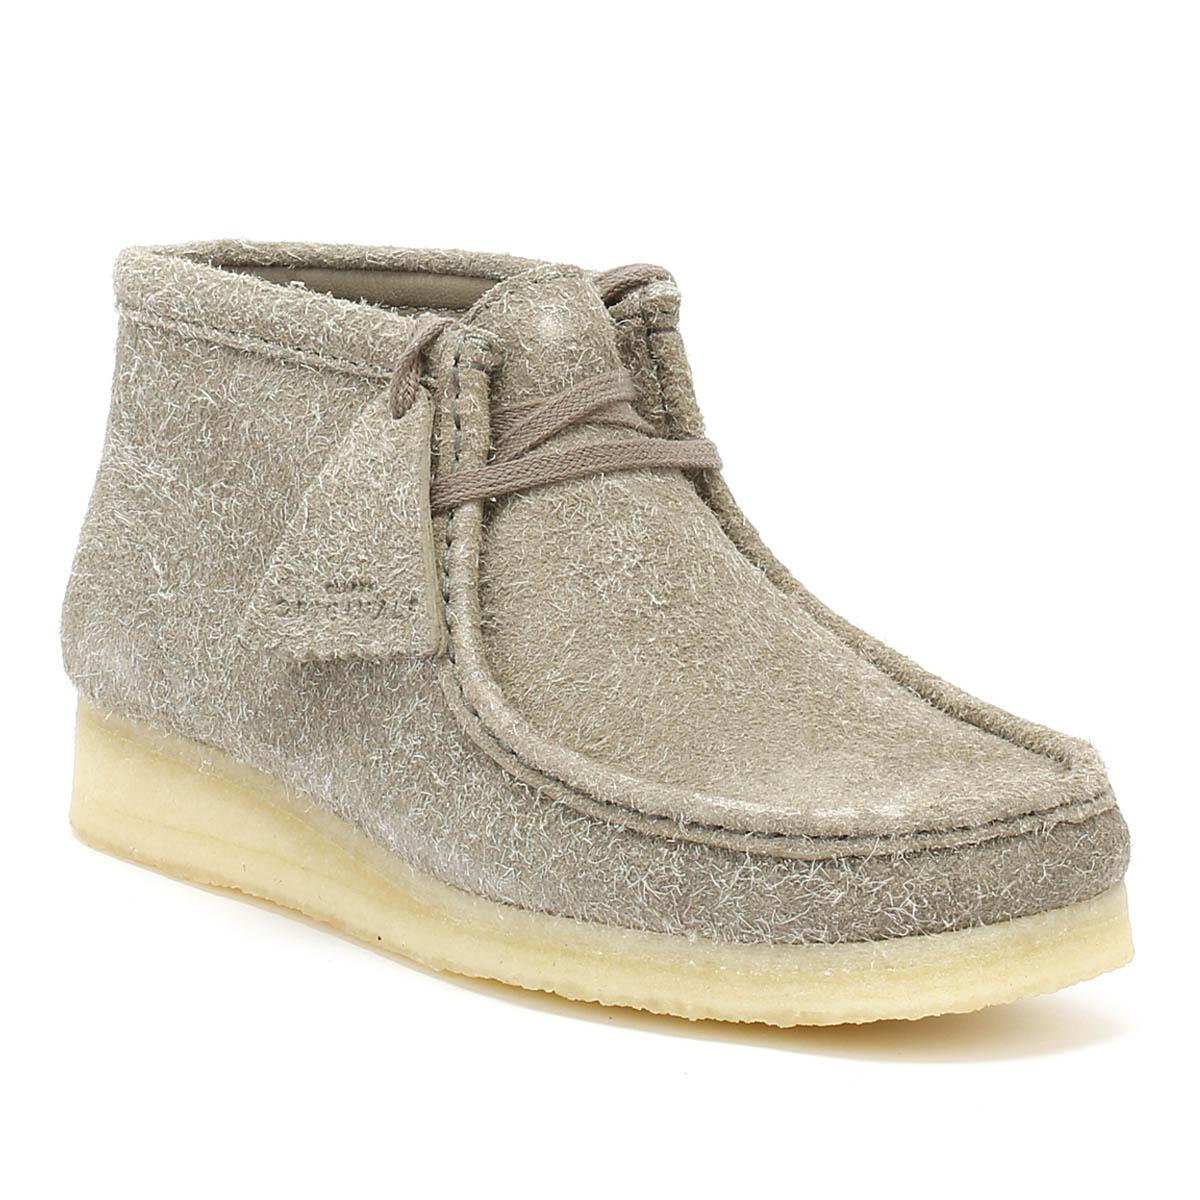 Lyst - Clarks Originals Womens Grey Interest Wallabee Boots in Gray 85a925e542